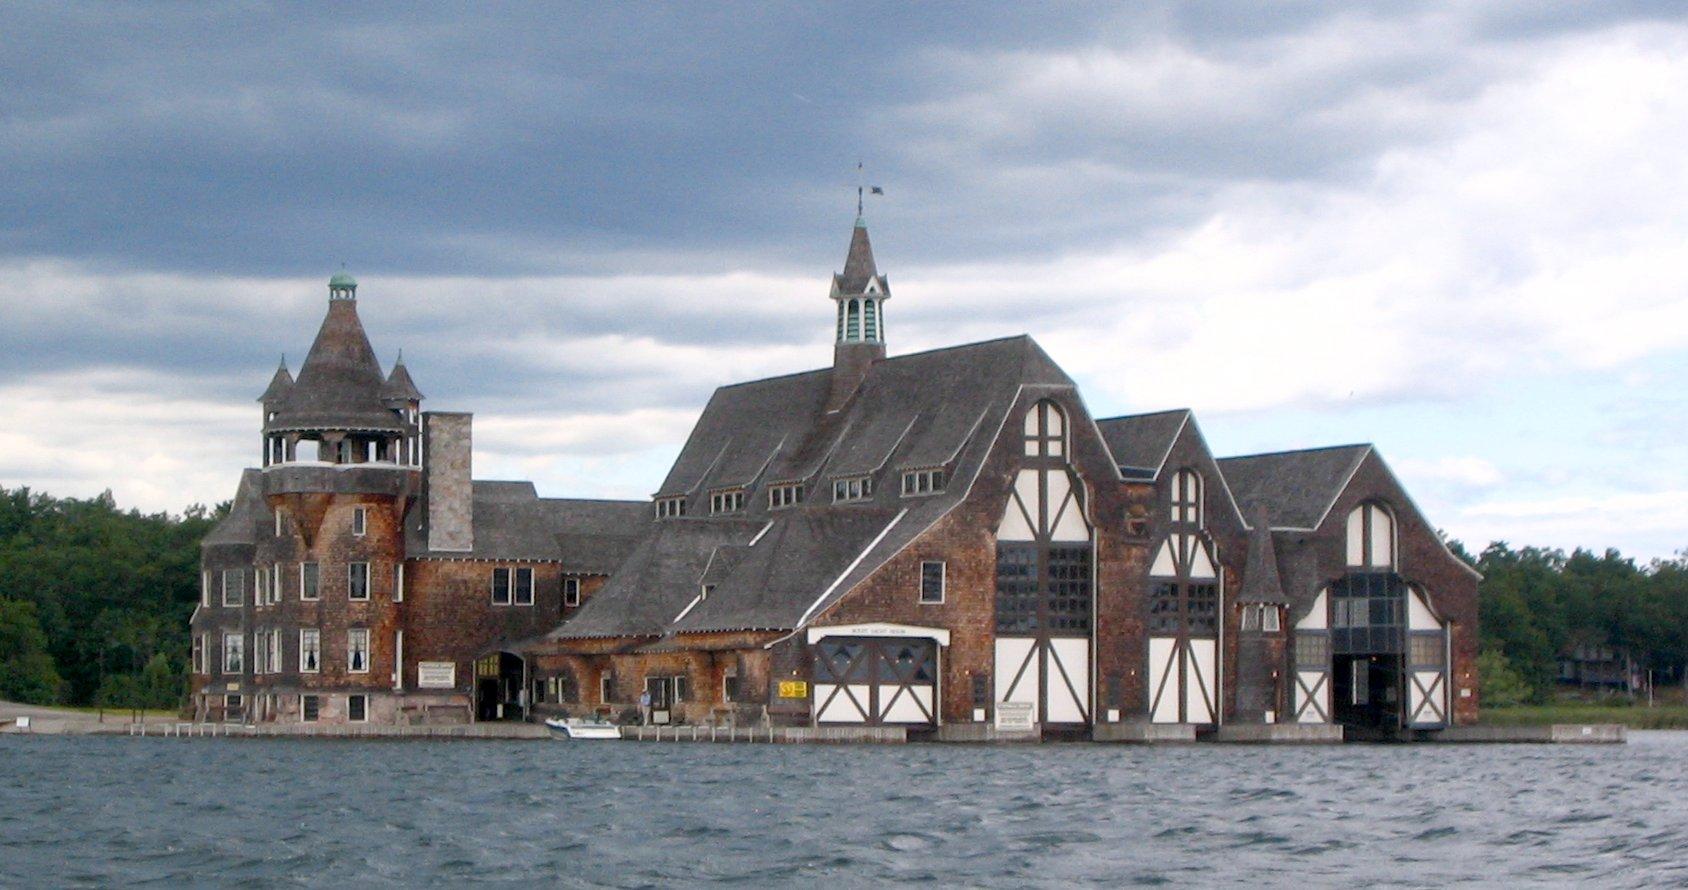 File:Boldt yacht house 2.jpg - Wikimedia Commons